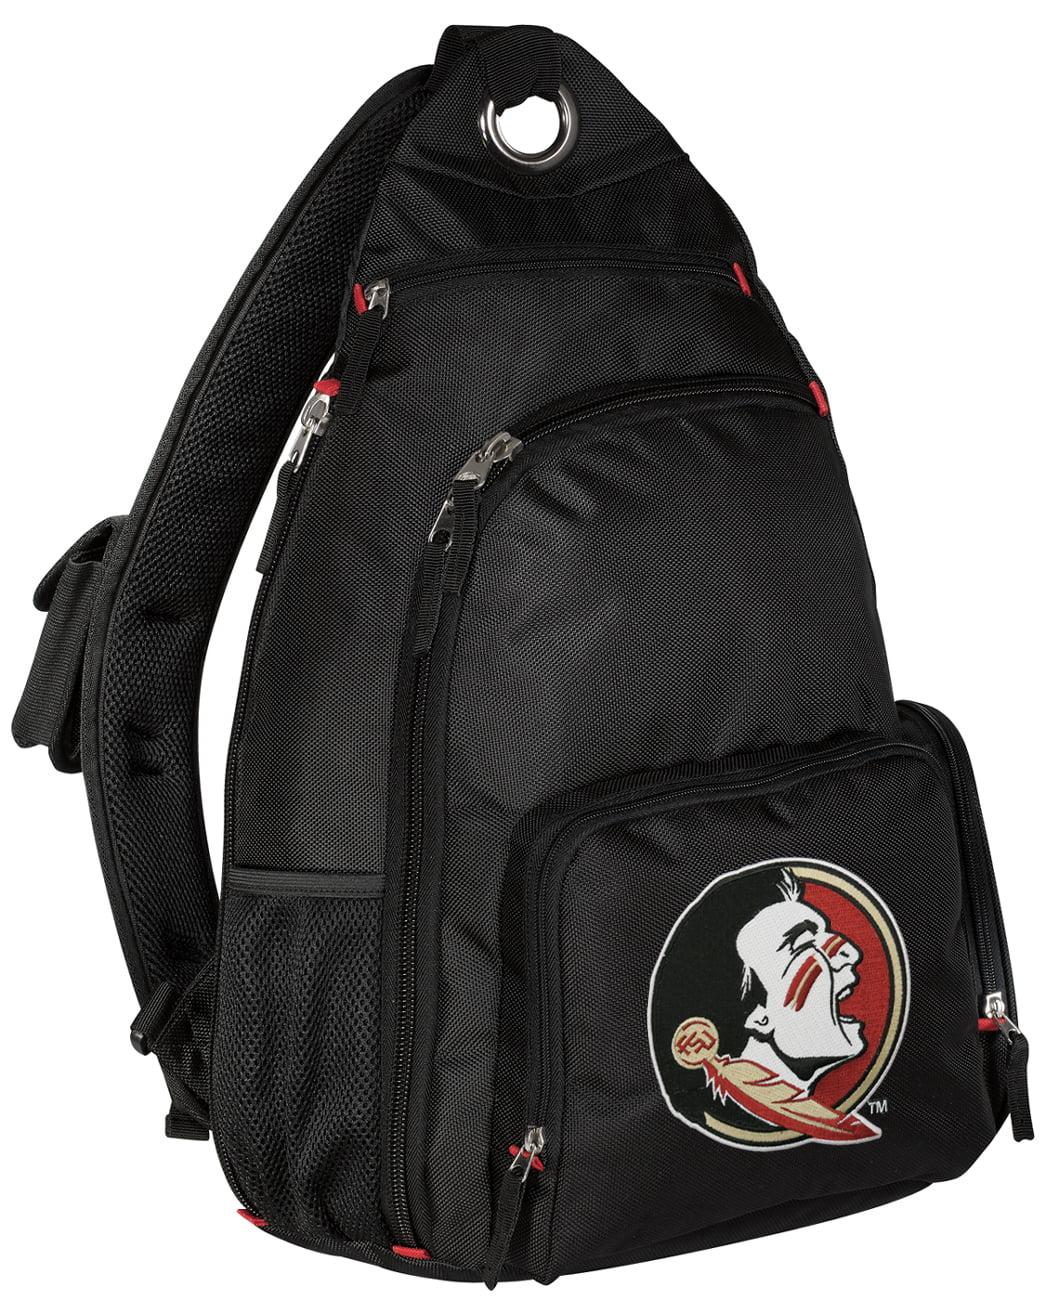 Florida State Backpack BEST Single Strap FSU Sling Backpack by